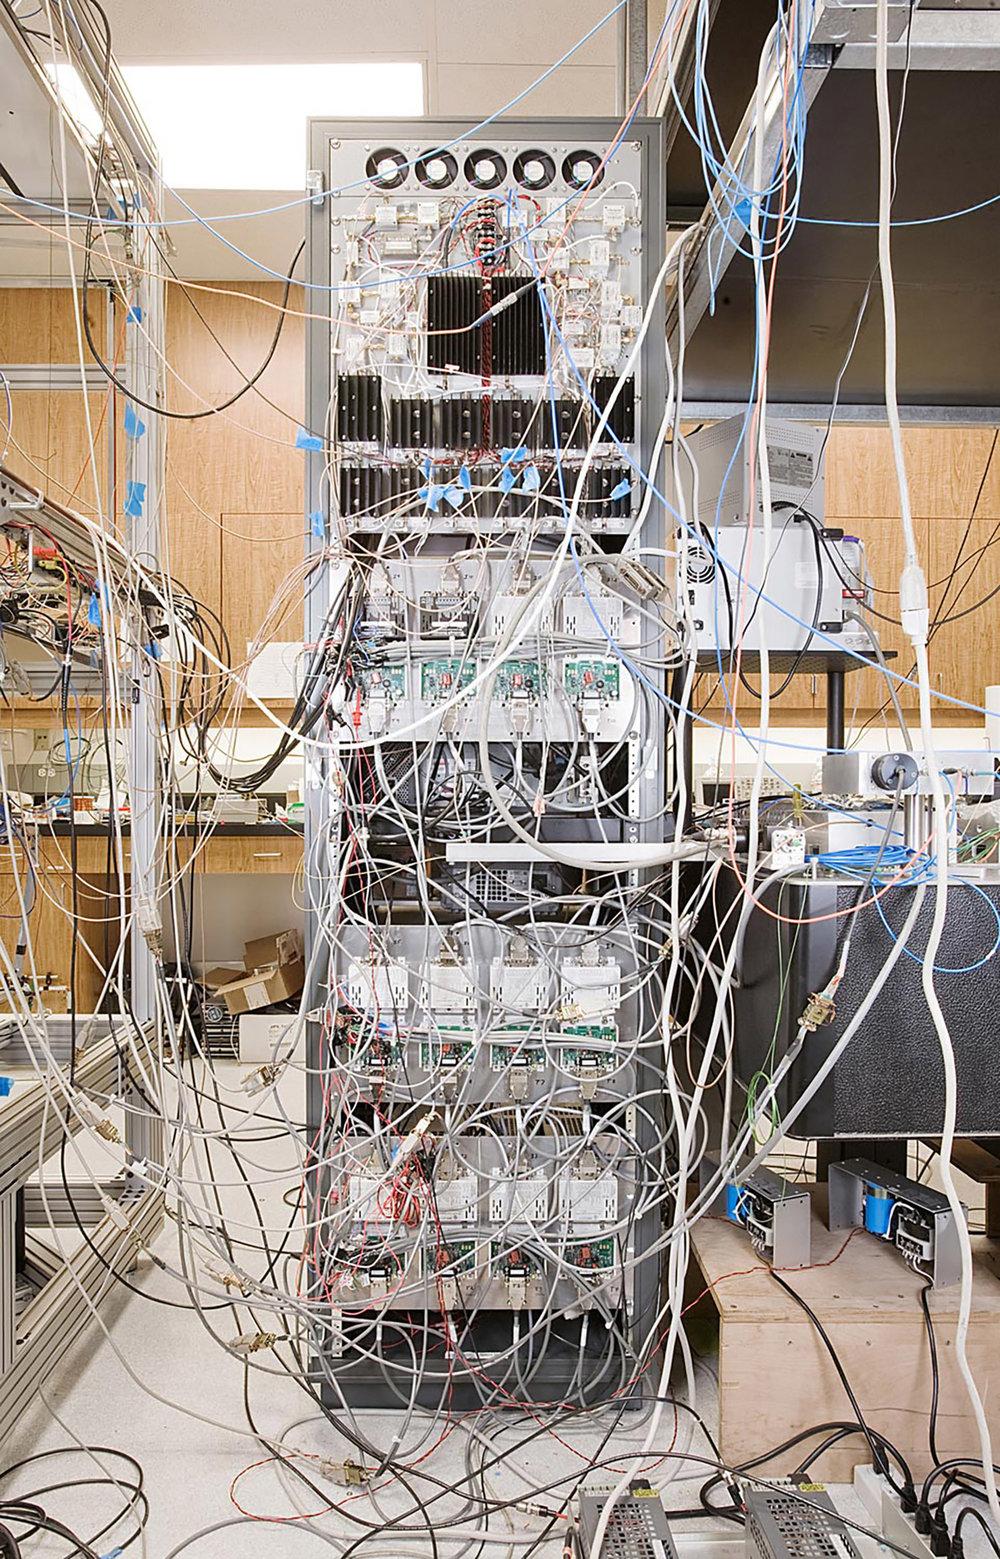 Hardware in the Quantum Lab at JPL